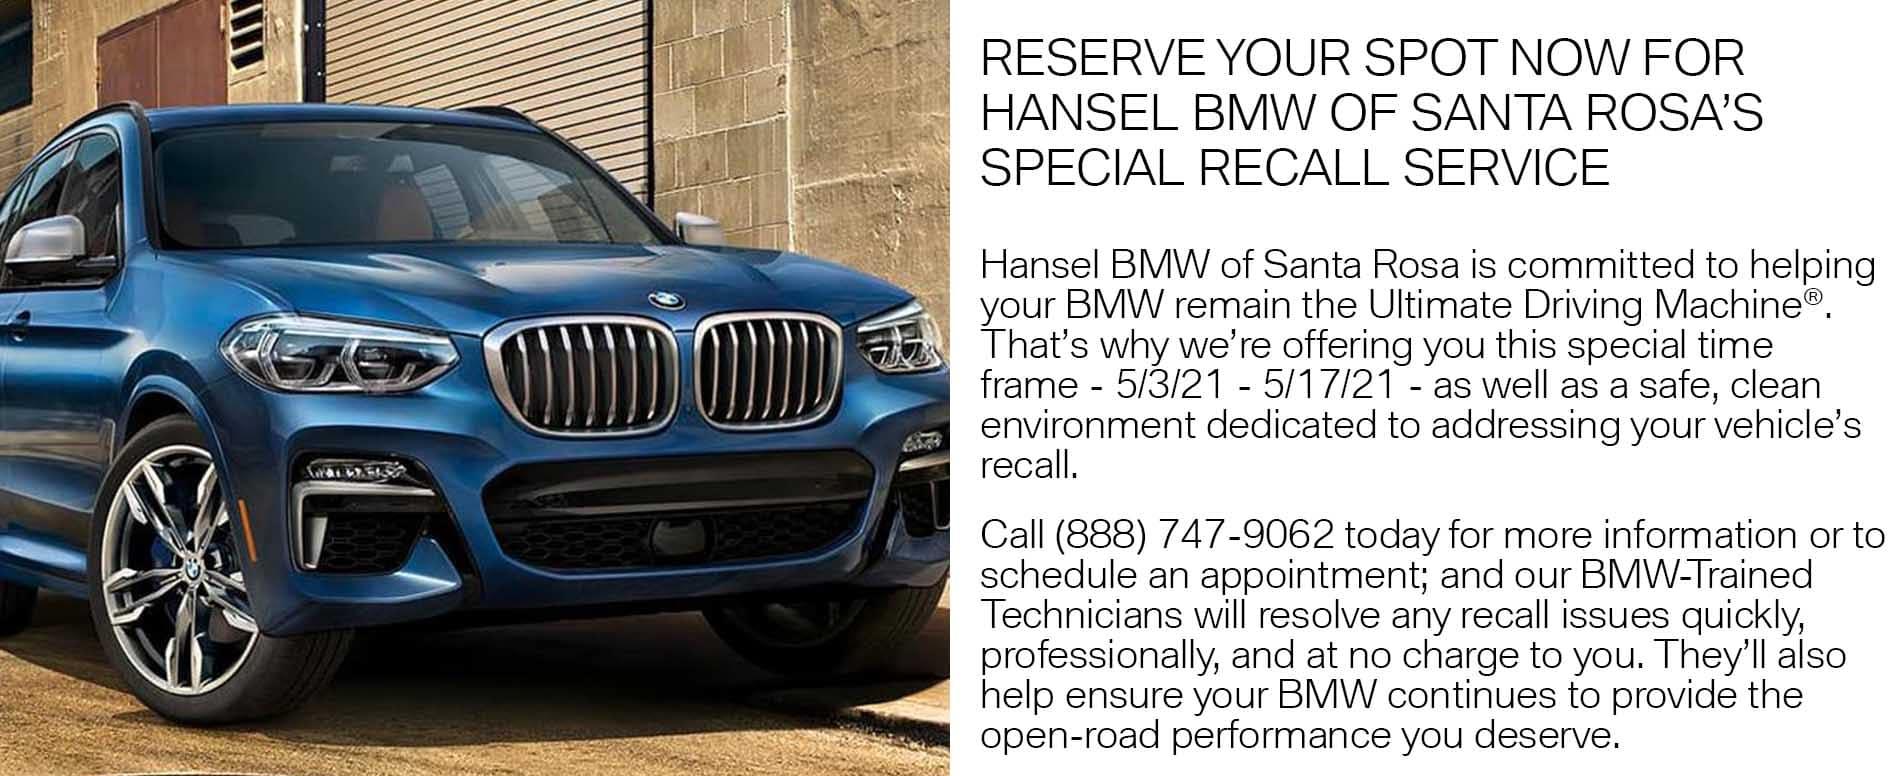 BMW Recall Service